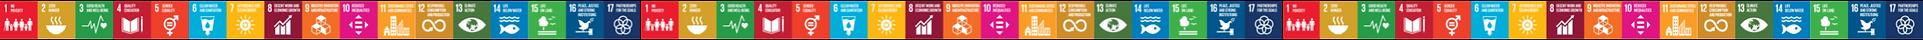 SDG Horizontal Image.png